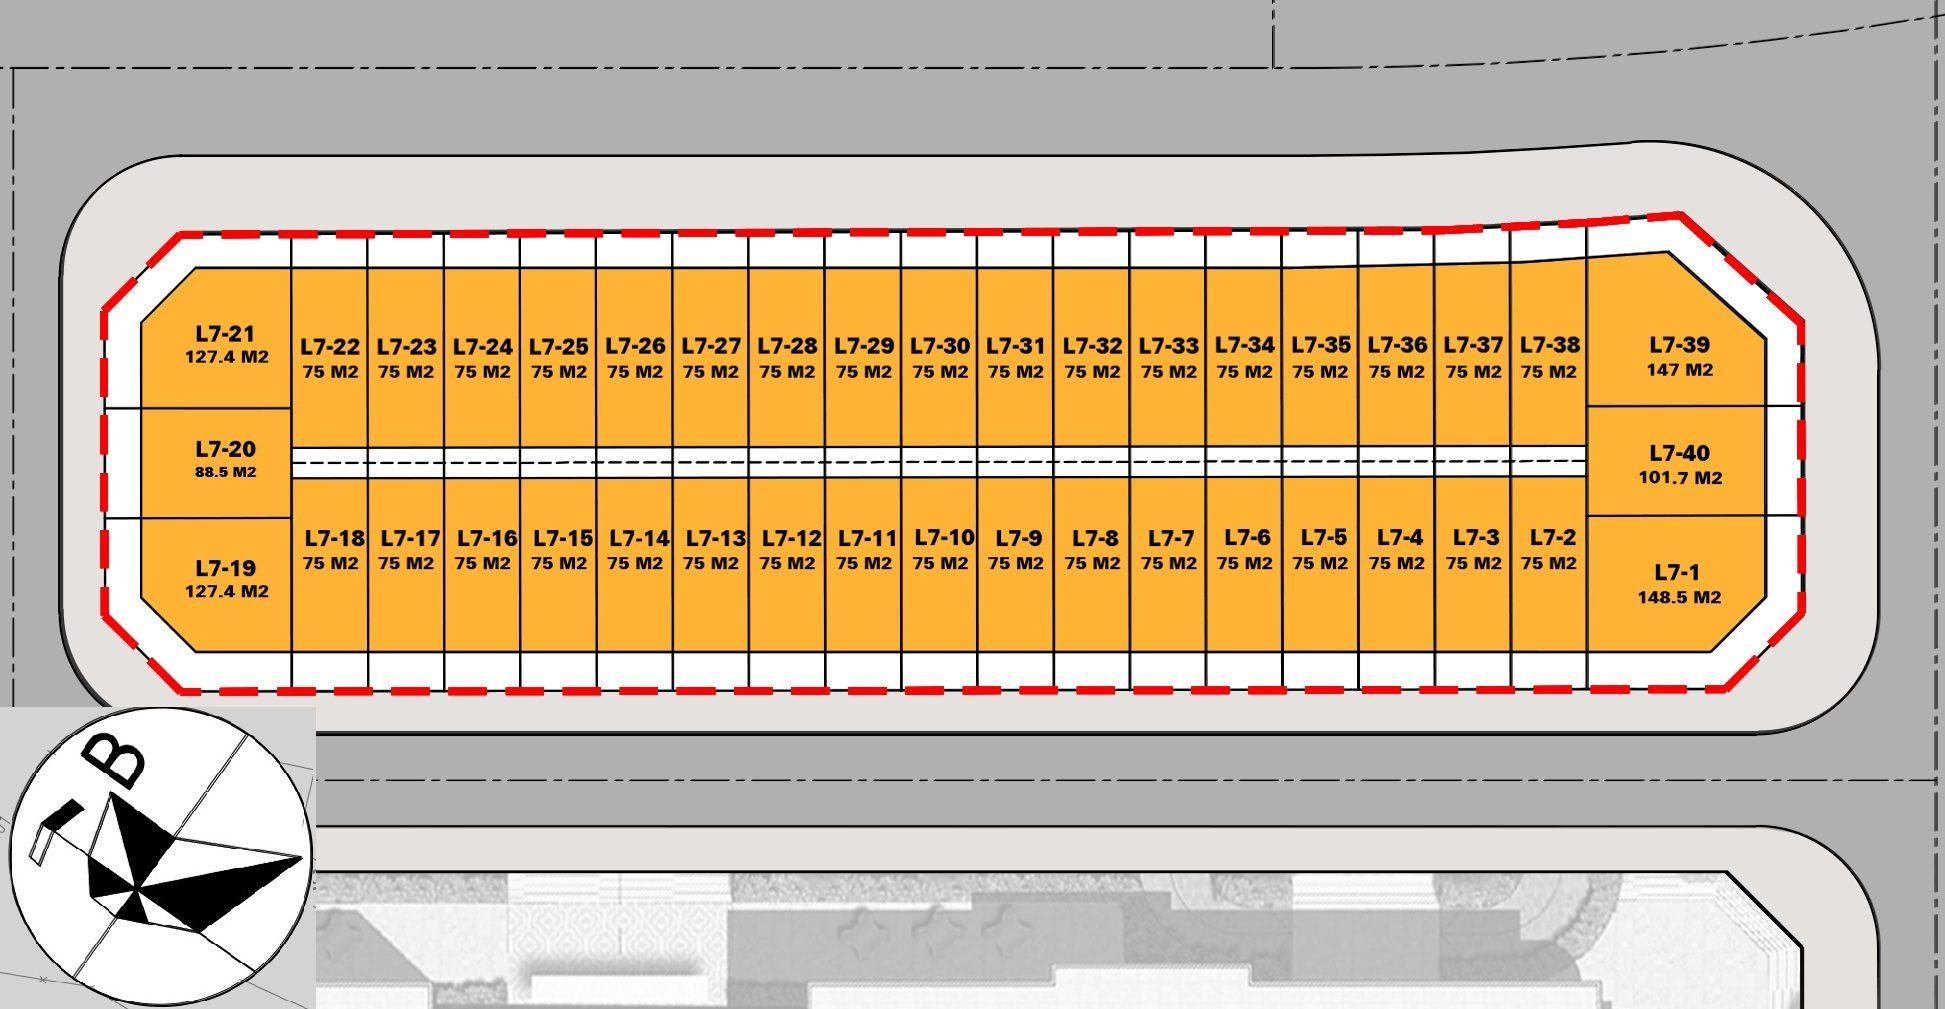 mat bang biet thu khu TT7 (L7-25) dai kim